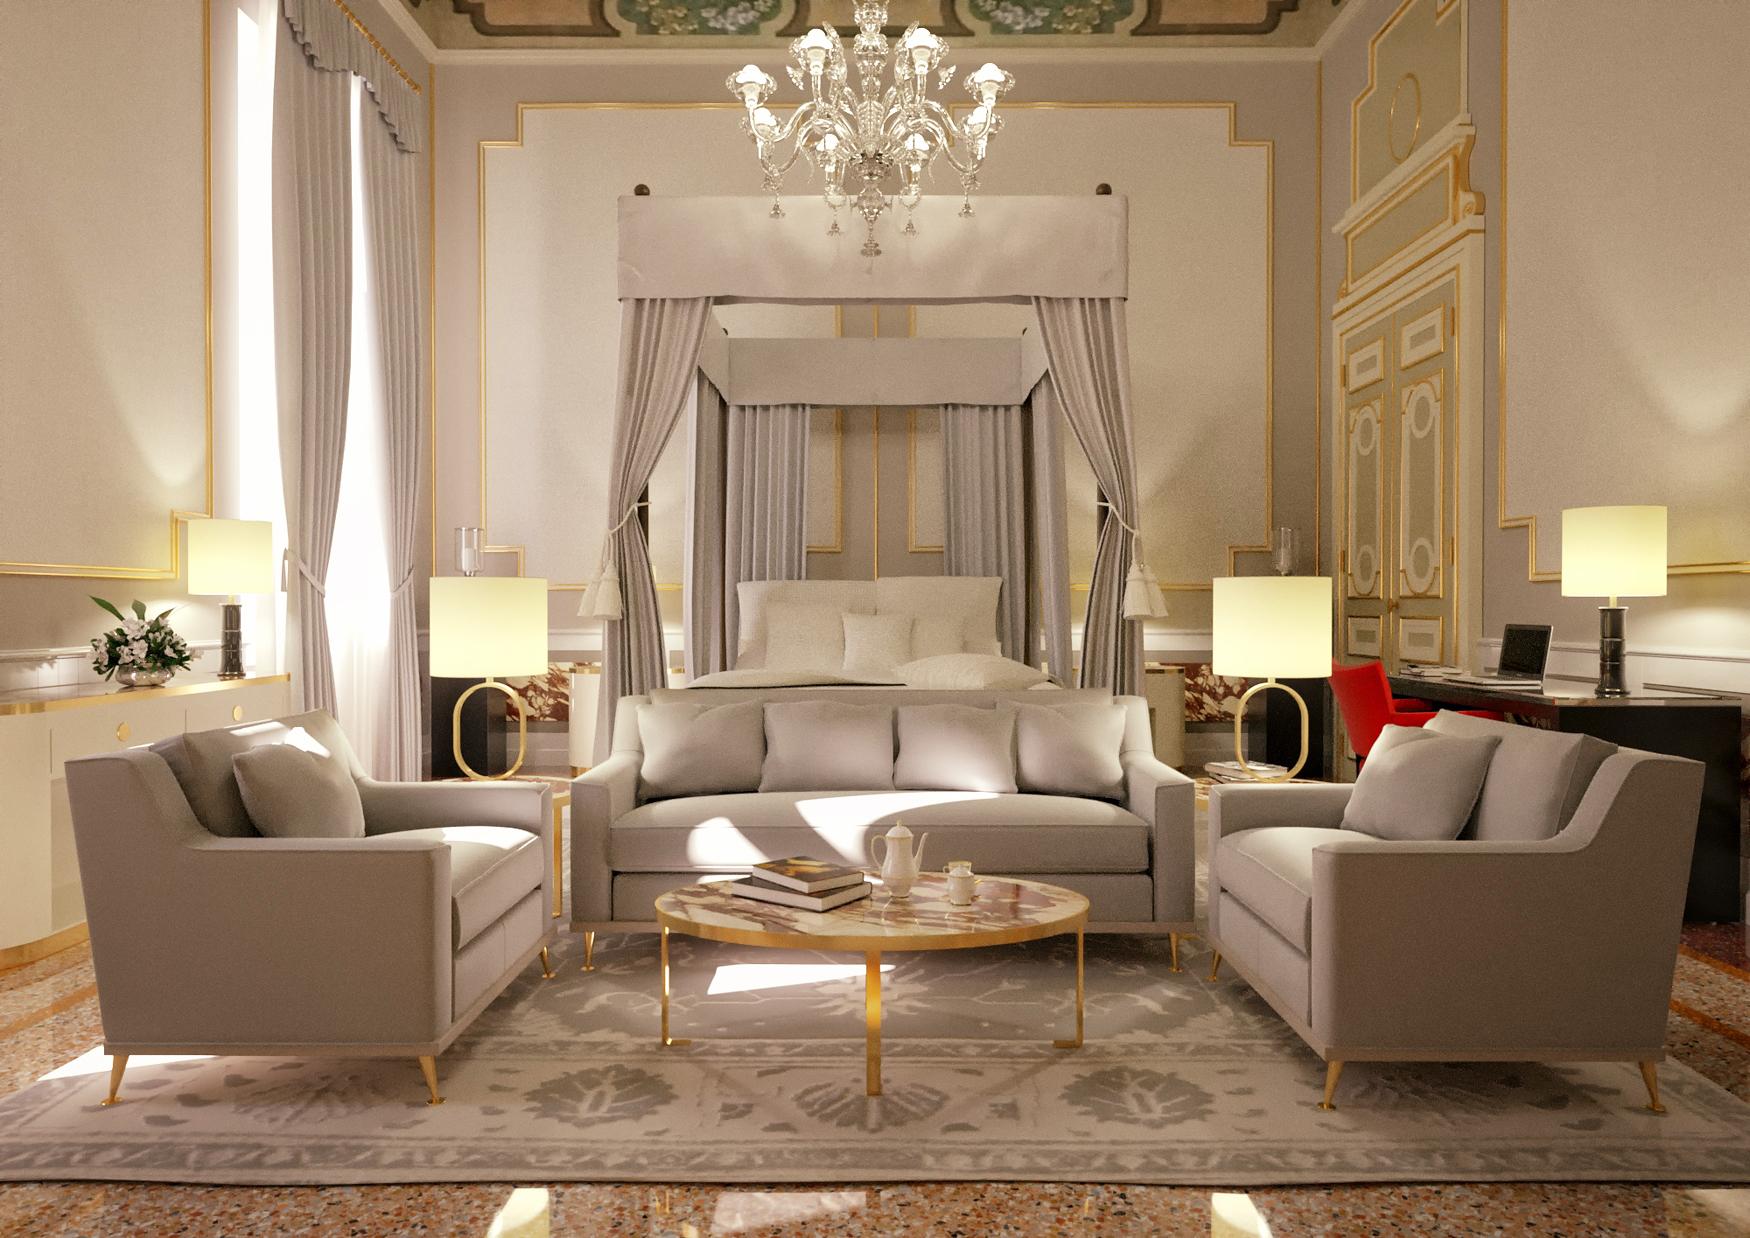 Ldc group to open new hotel in venice ldc italian hotels for Design hotel venice